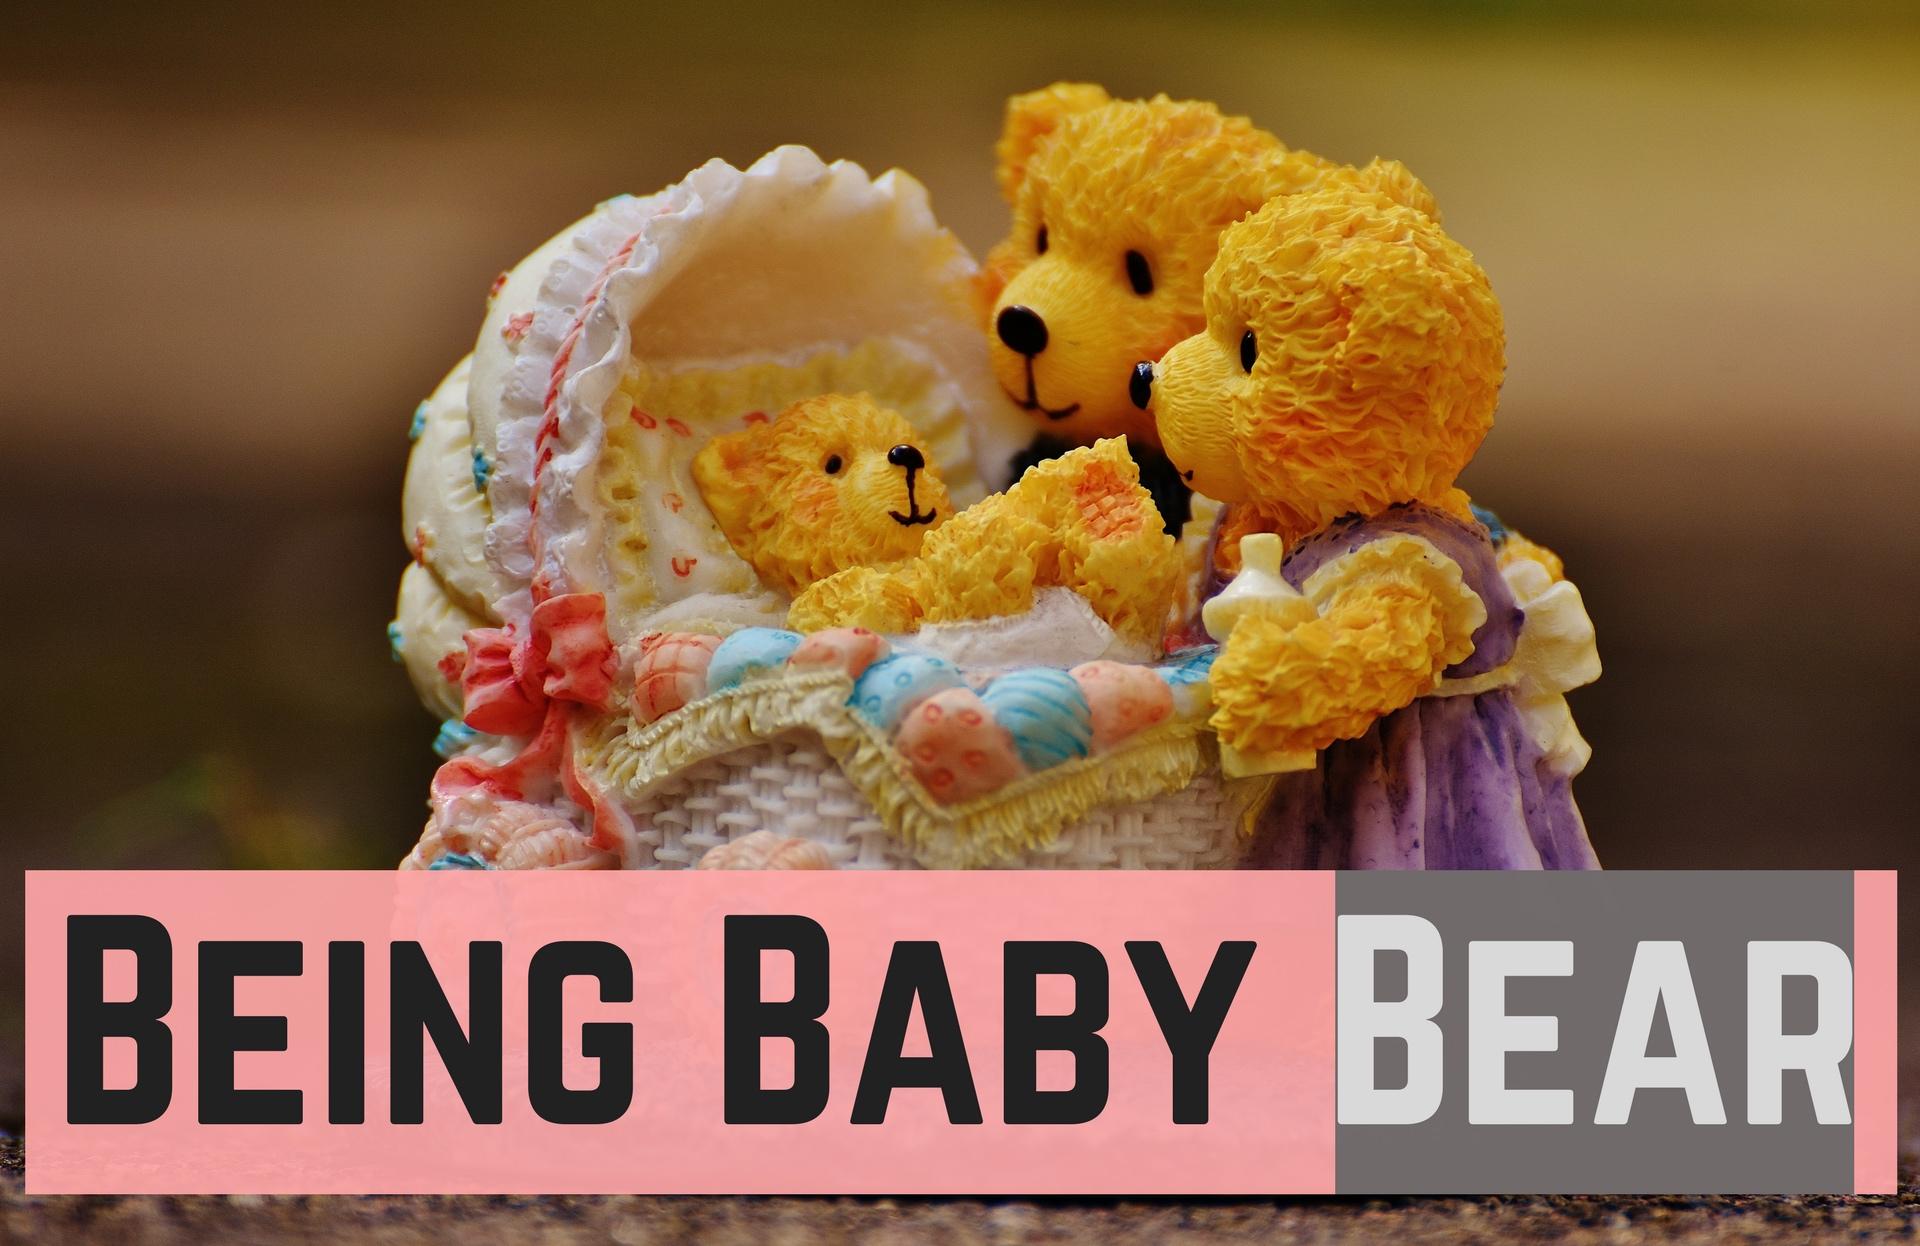 Being Baby Bear.jpg